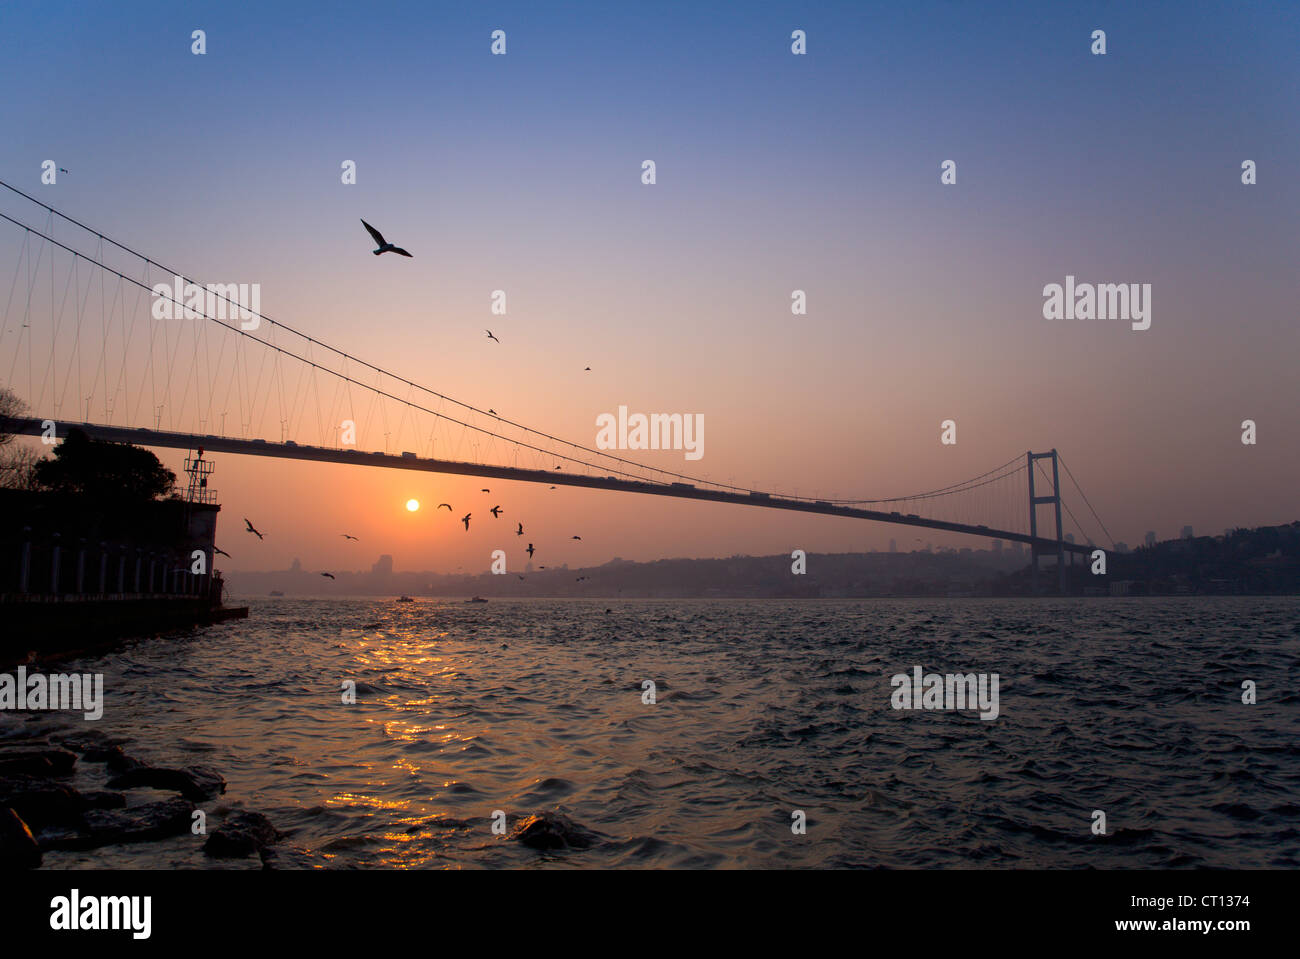 Birds flying over bridge on urban bay - Stock Image